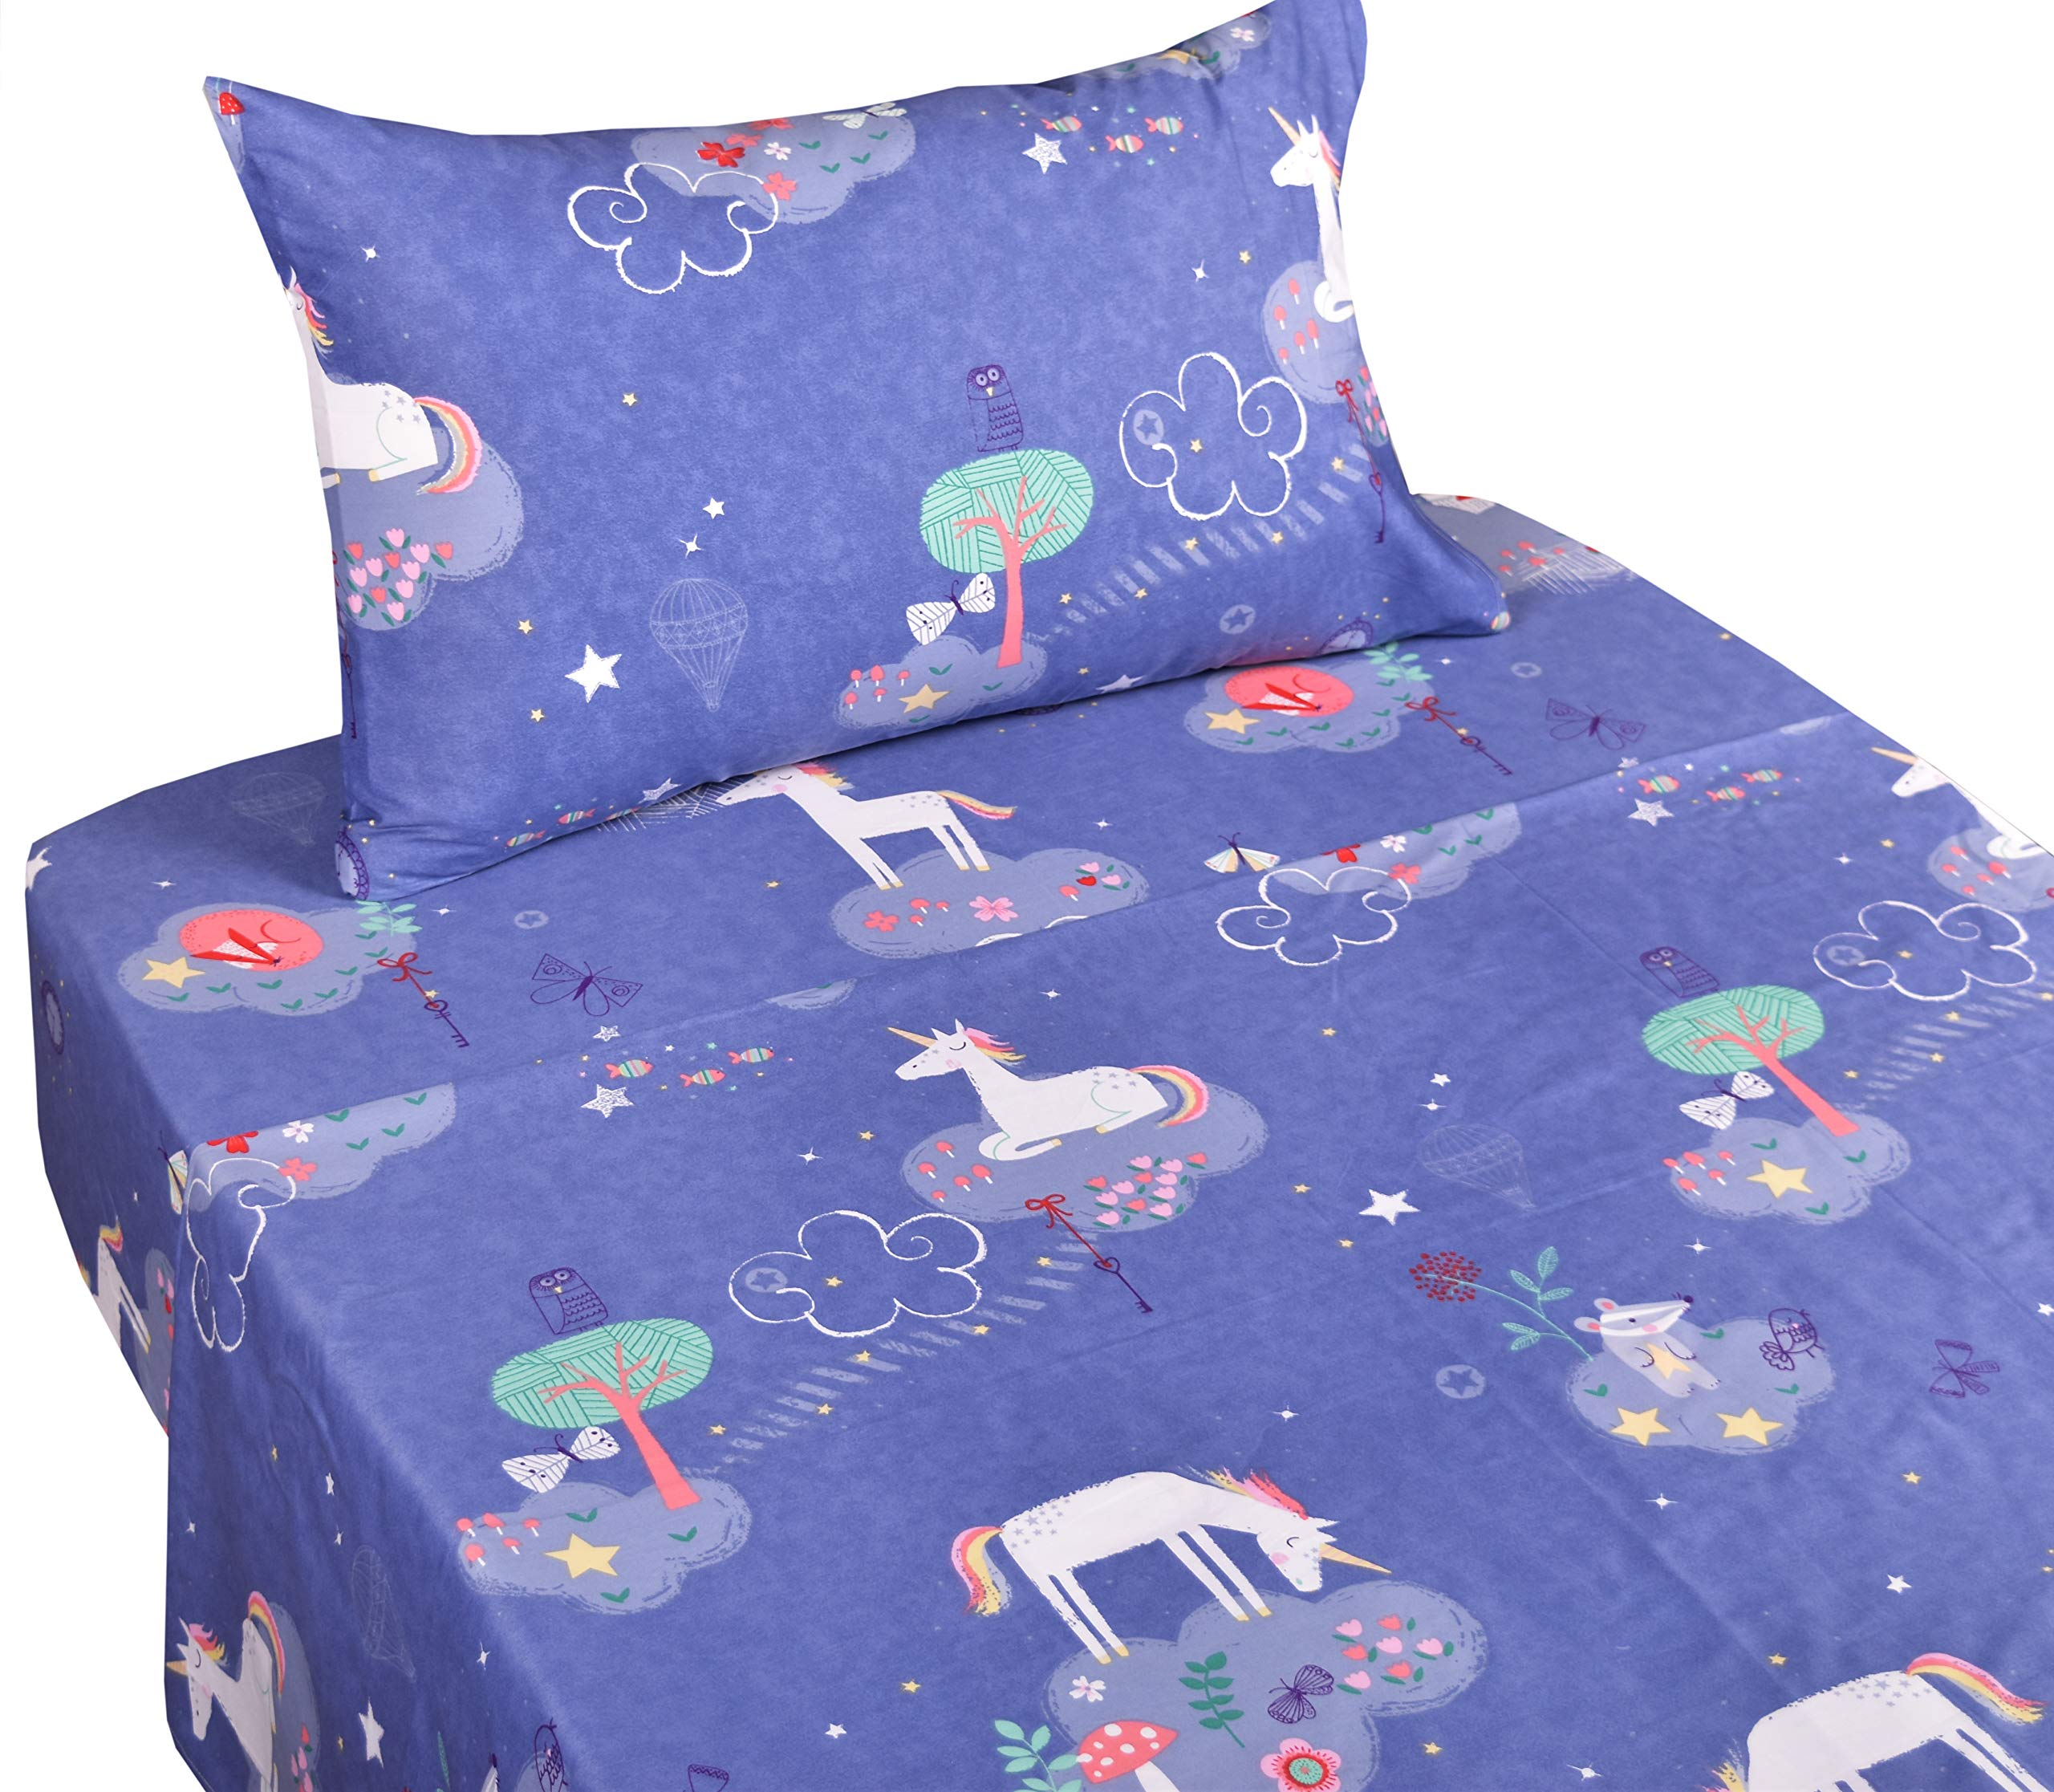 J-pinno Unicorn Dreaming Playing Twin Sheet Set for Kids Girl Children,100% Cotton, Flat Sheet + Fitted Sheet + Pillowcase Bedding Set